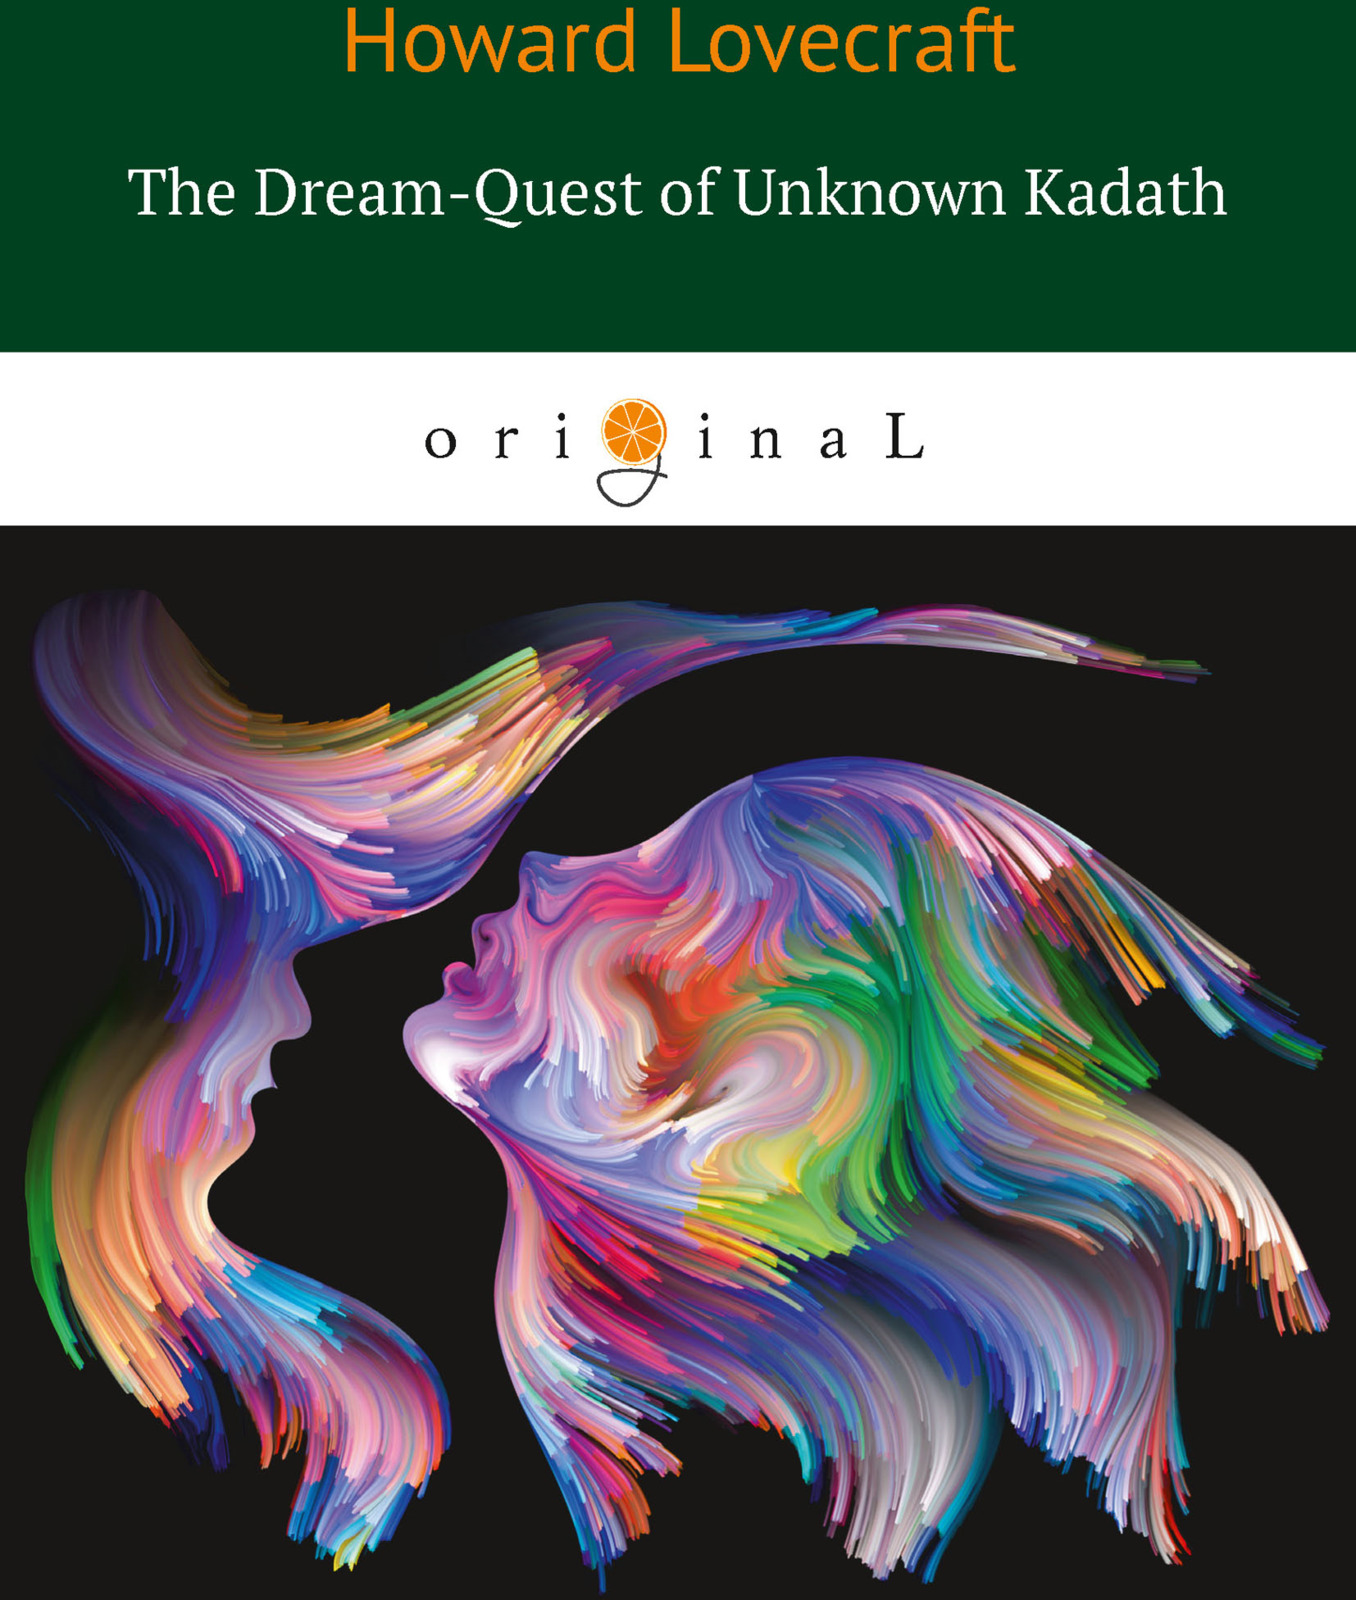 H. Lovecraft The Dream-Quest of Unknown Kadath howard phillips lovecraft the dream quest of unknown kadath